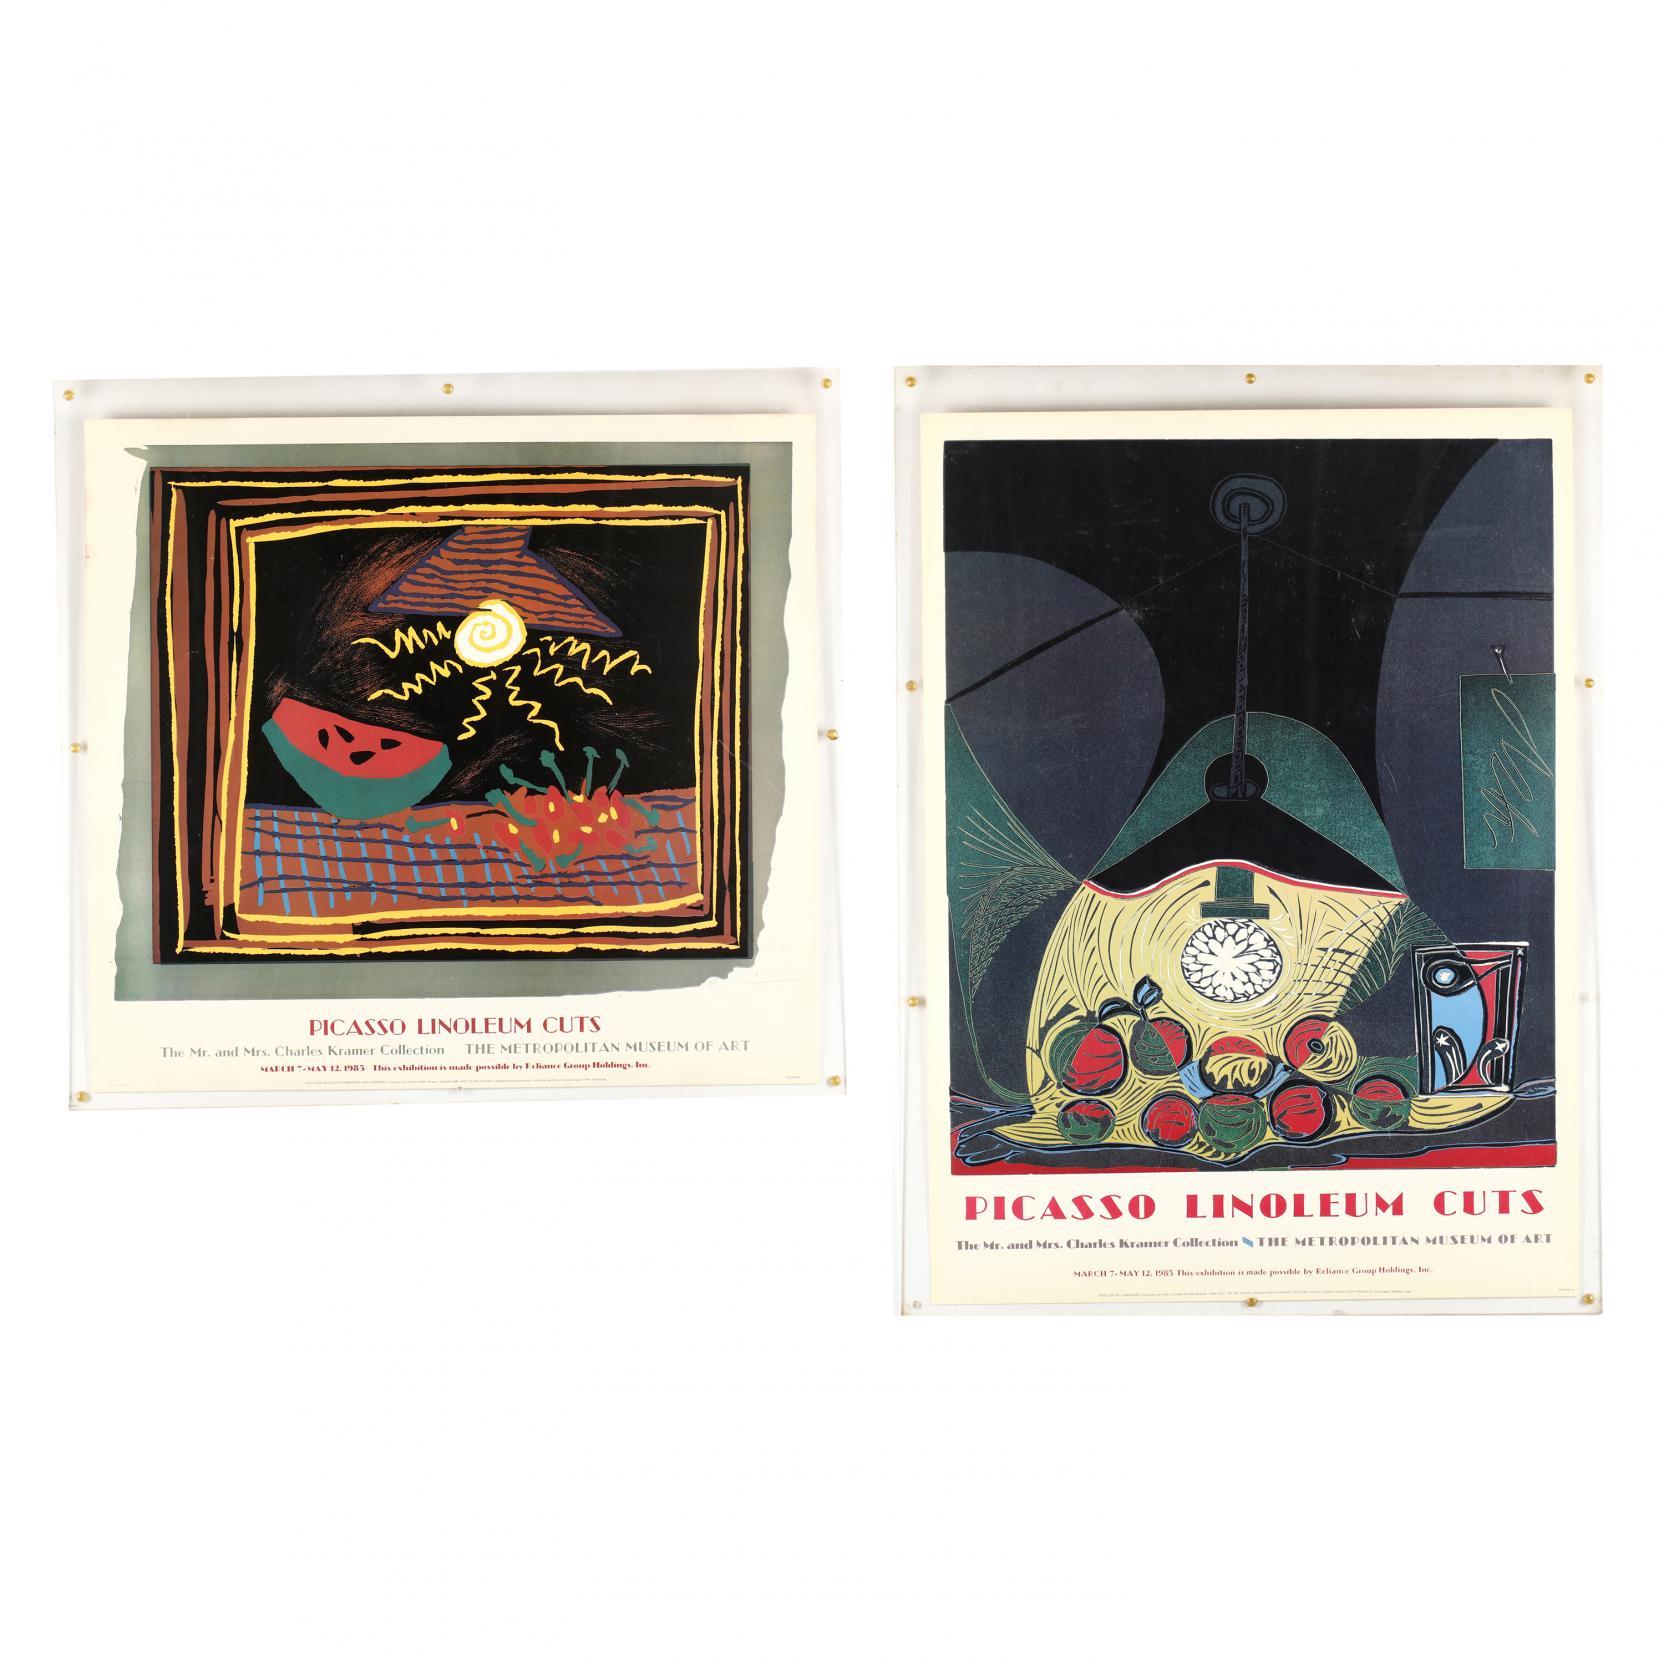 two-exhibition-posters-for-picasso-linoleum-cuts-metropolitan-museum-1985